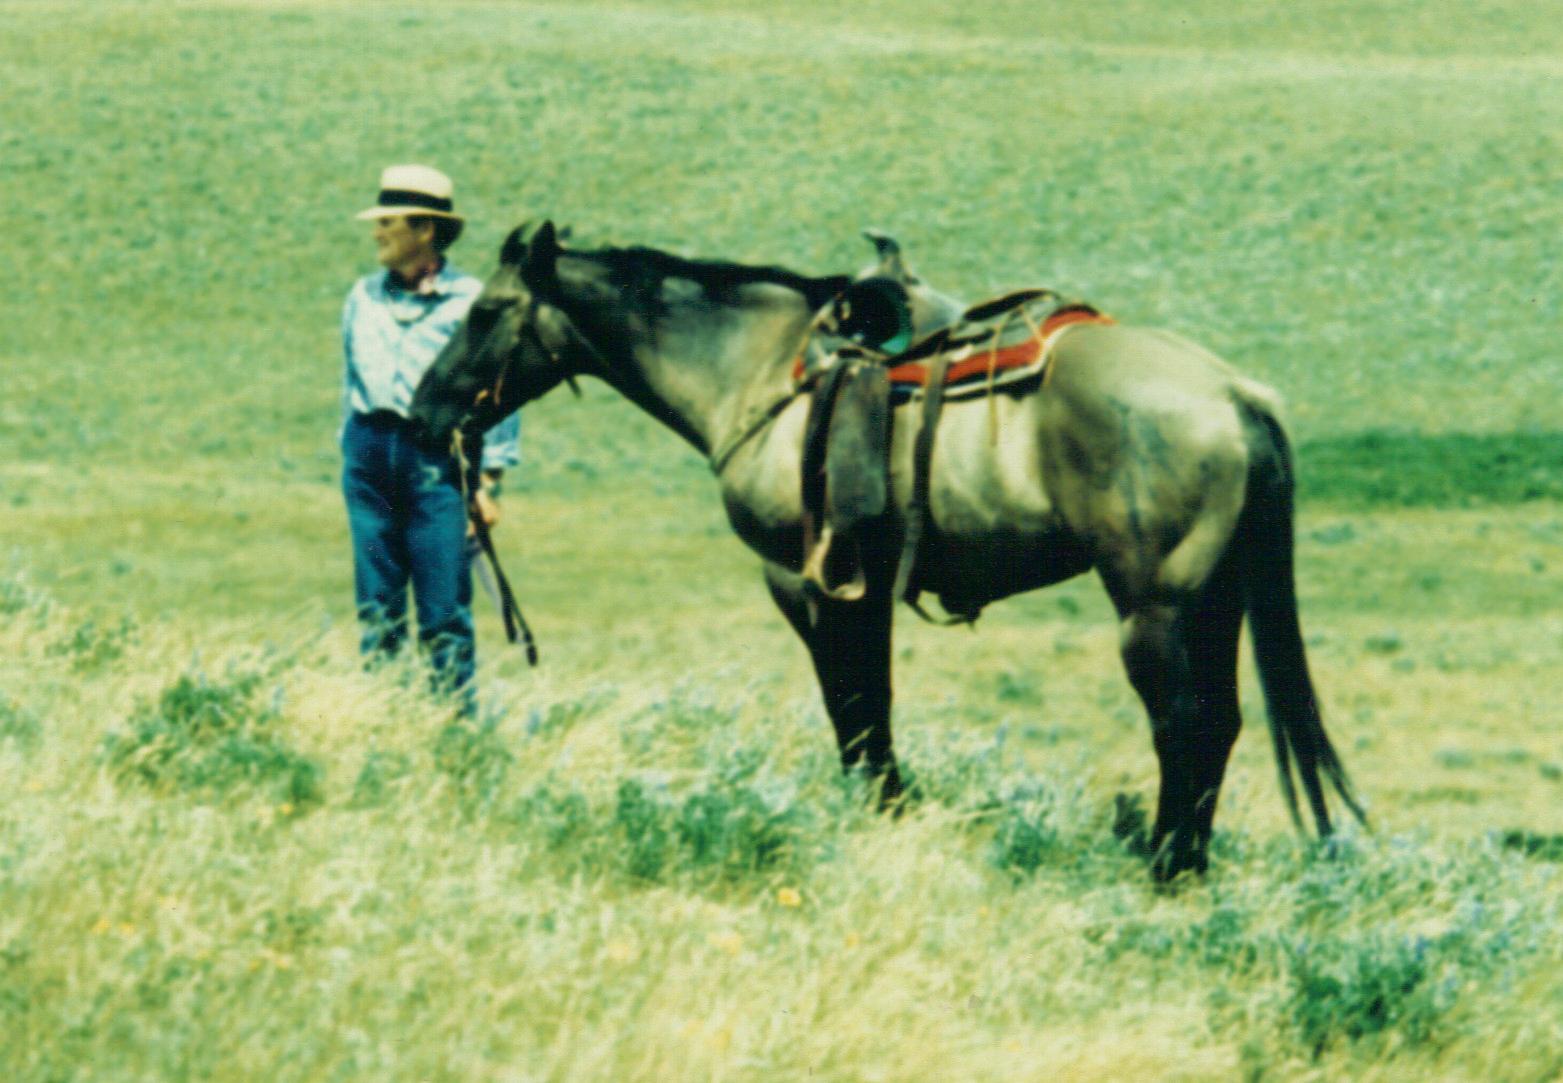 A Veterinarian's Take: Horse Human Bond